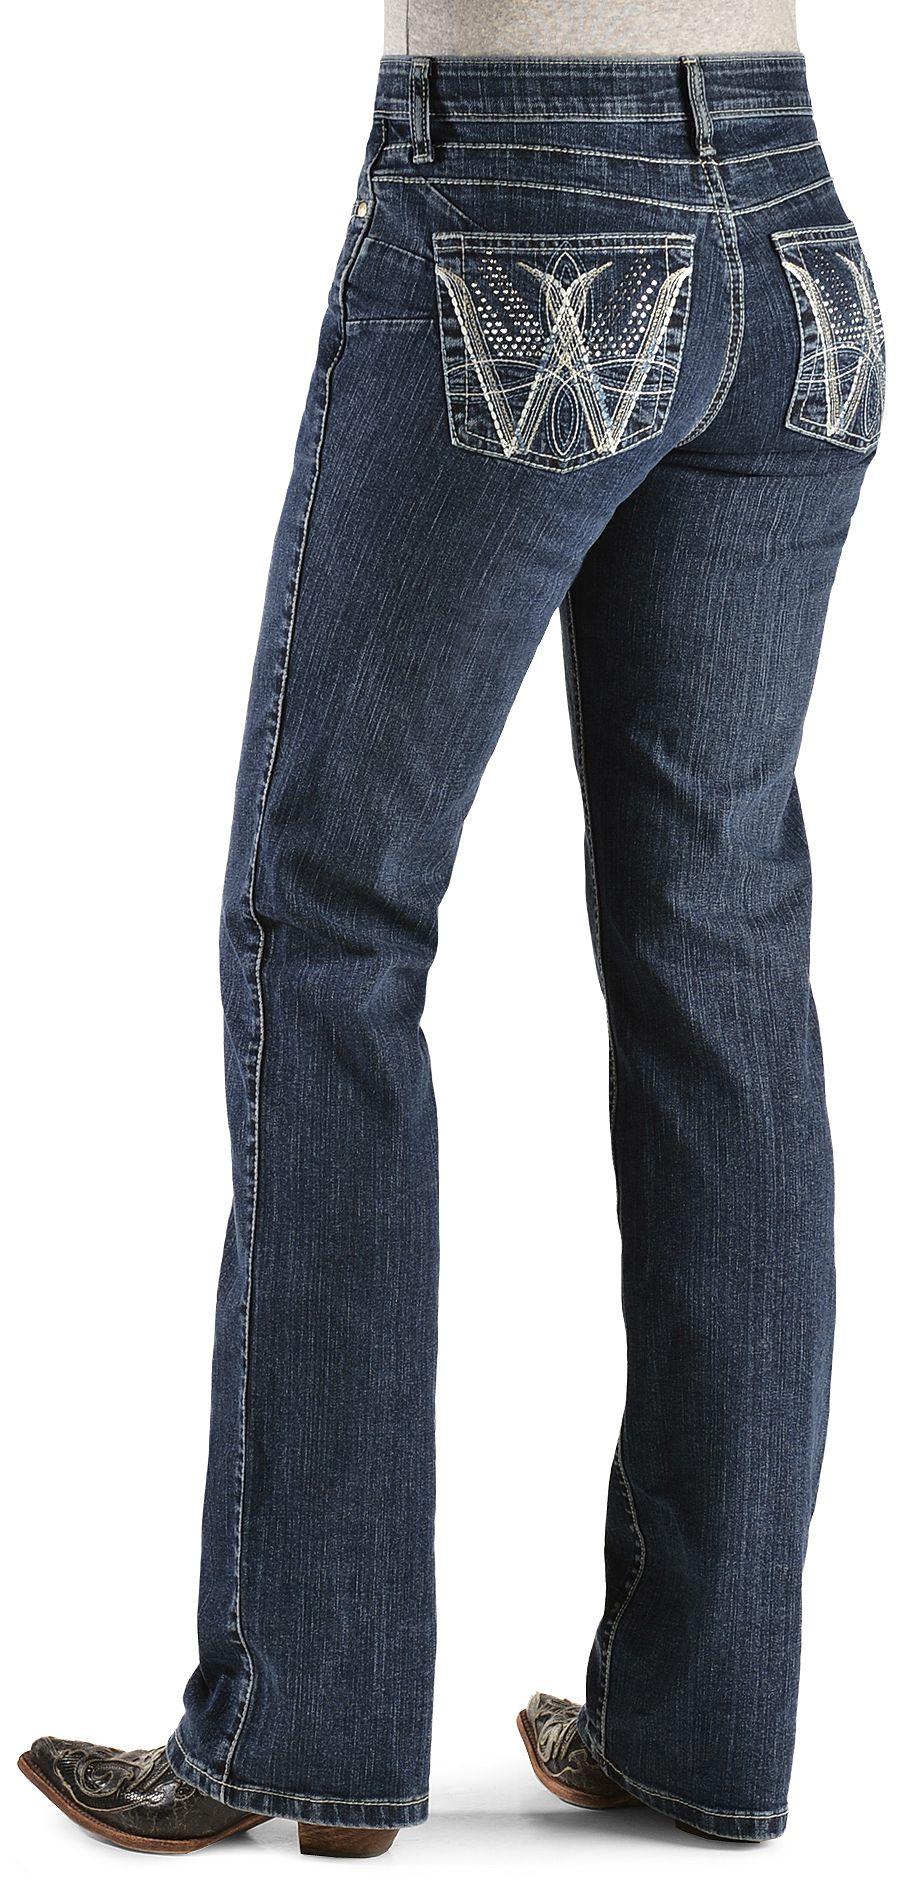 Wrangler Q Baby Booty Up Embellished Jeans Sheplers